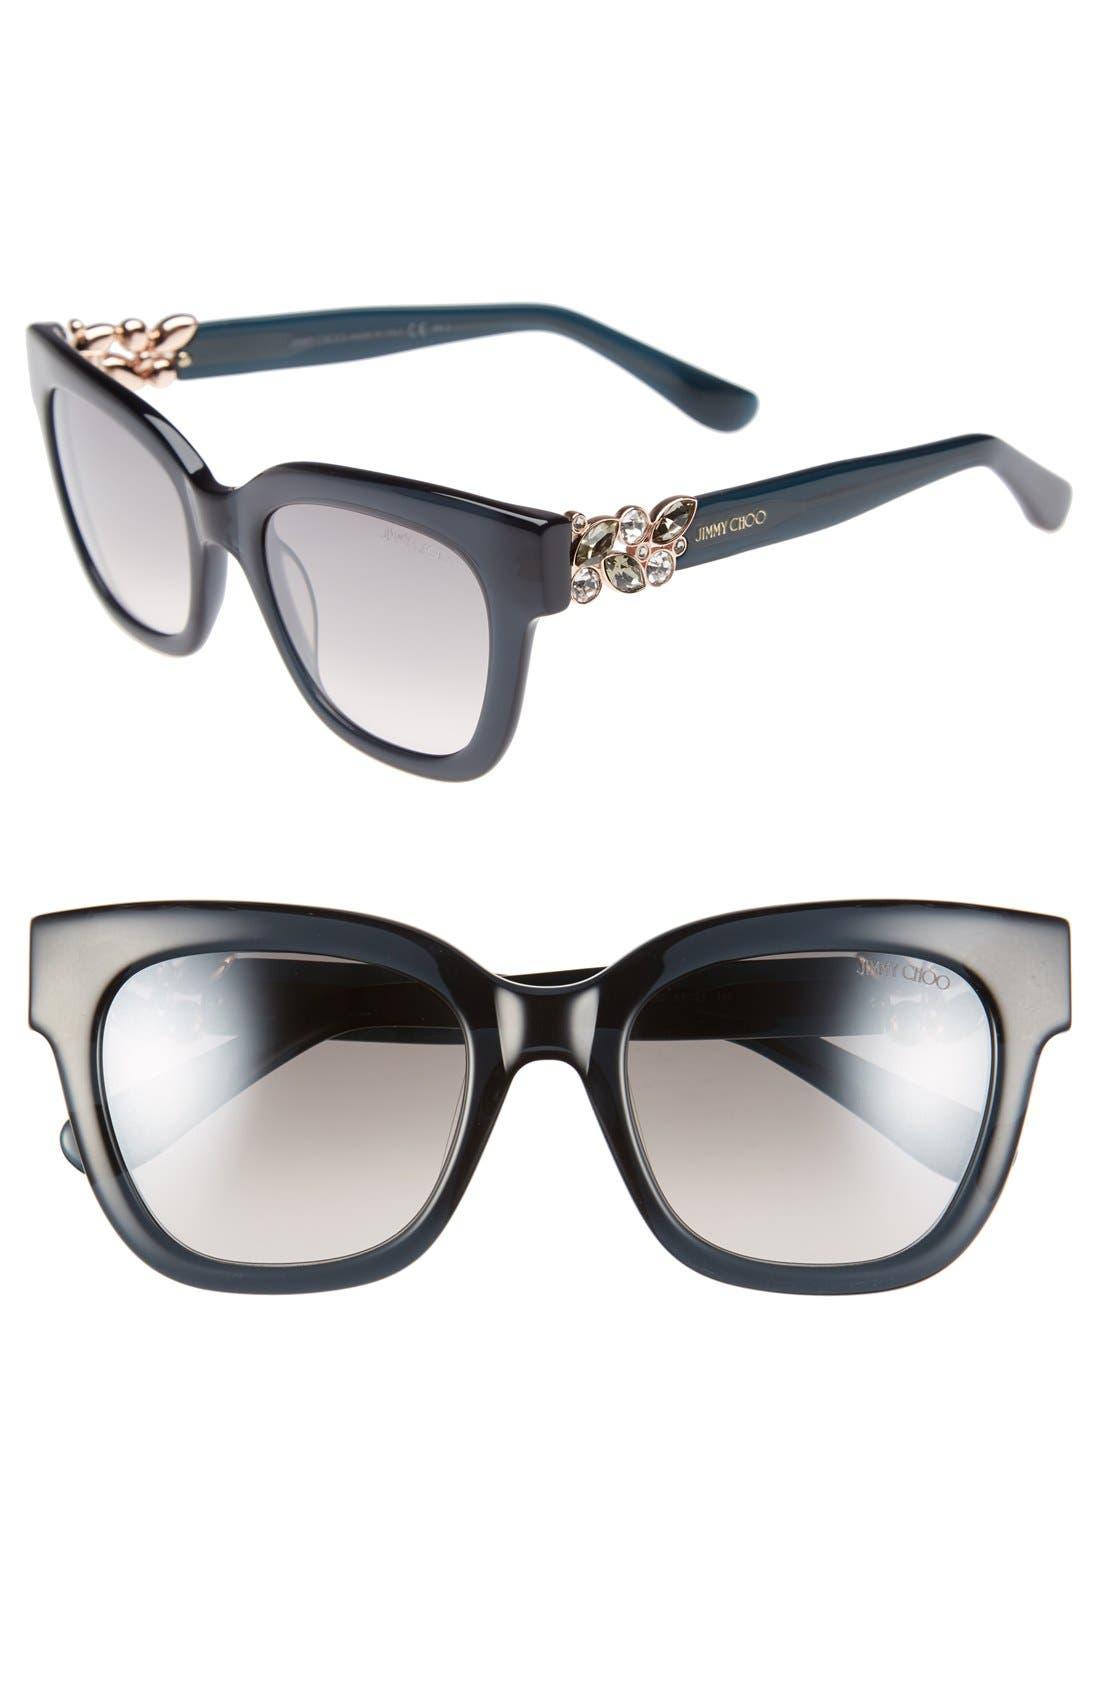 Alternate Image 1 Selected - Jimmy Choo 'Maggi' 51mm Crystal Embellished Sunglasses